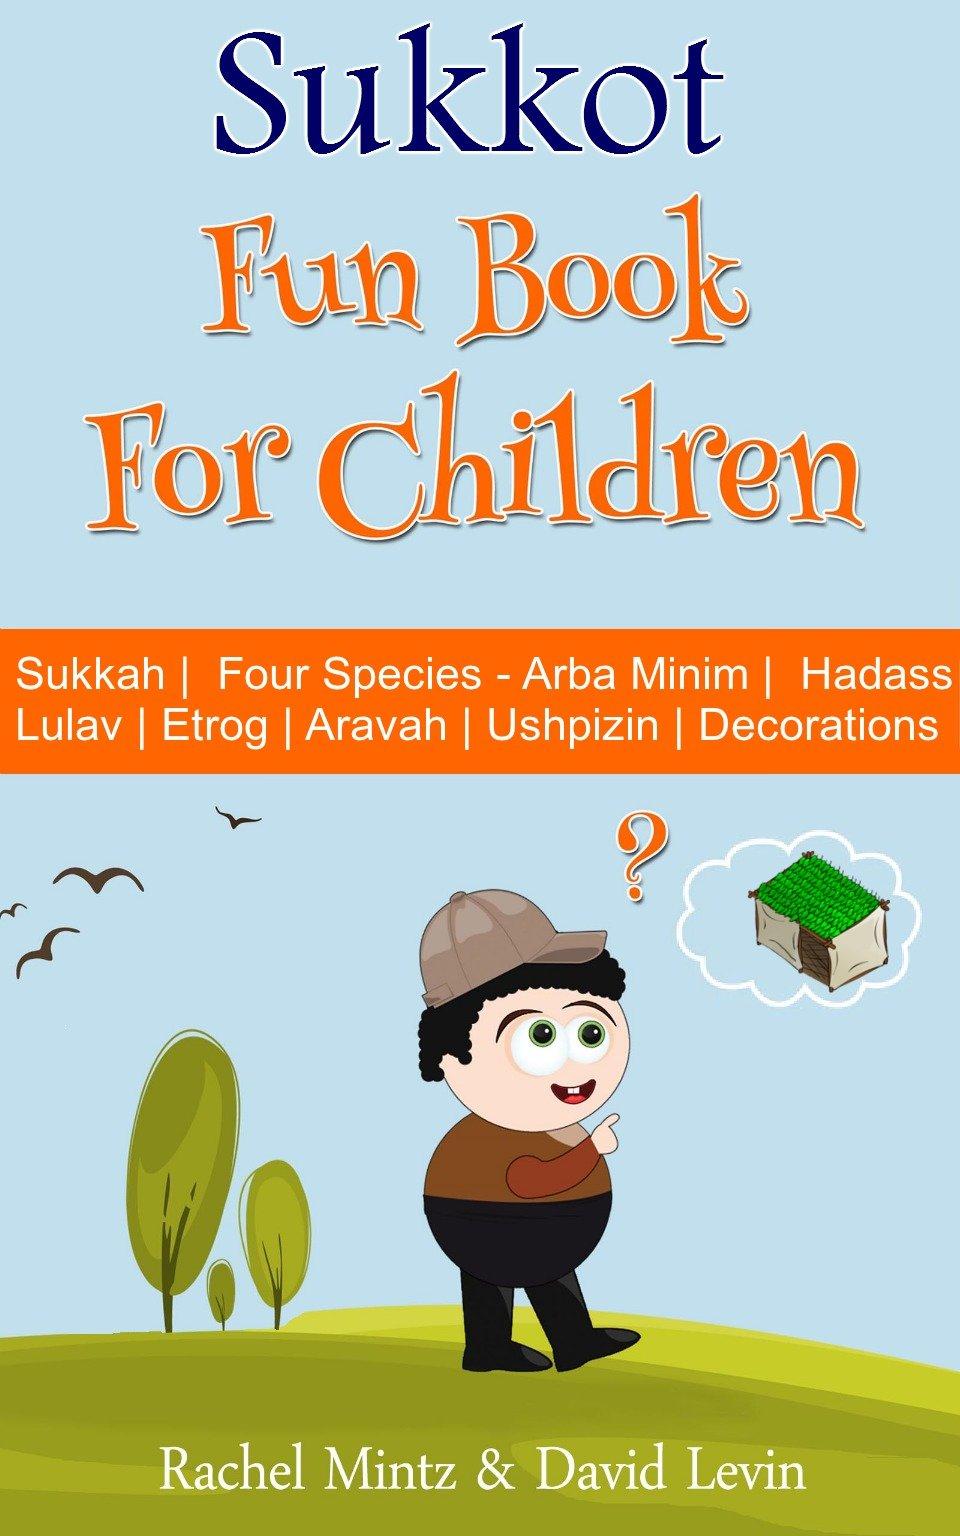 Sukkot   Fun Book For Children  Sukkah   Four Species   Arba Minim   Etrog   Lulav   Hadass   Aravah   Ushpizin   Decorations  English Edition